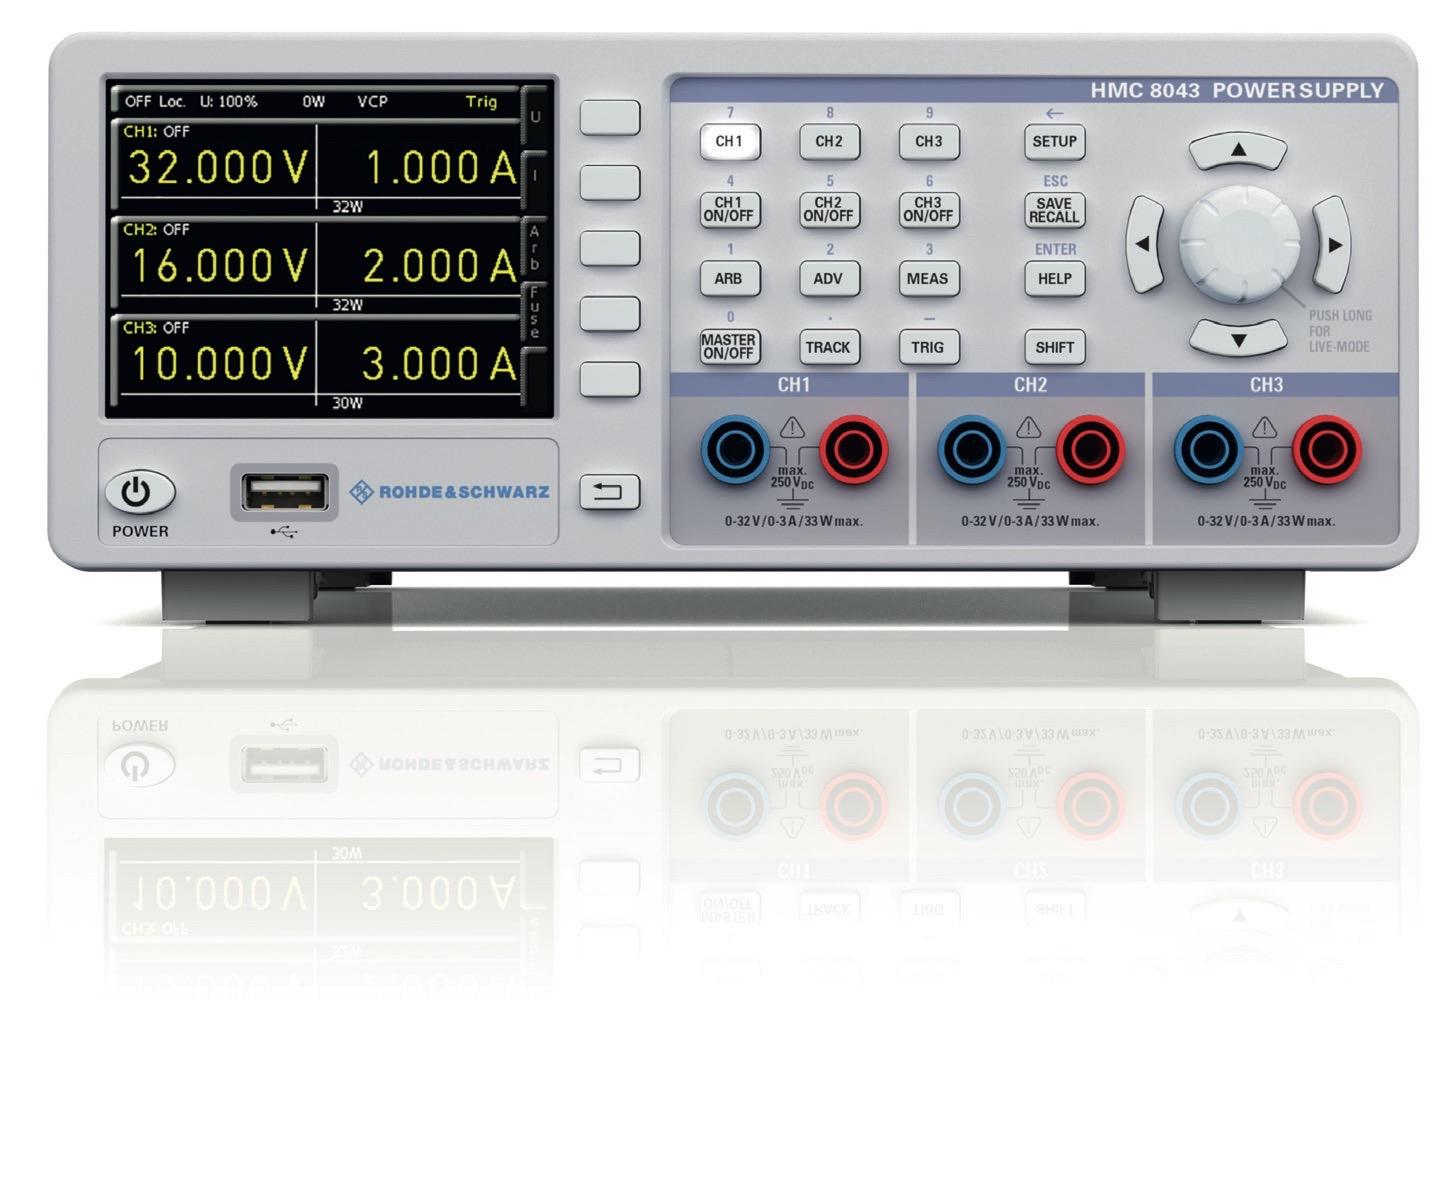 R&S HMC804X series programmable DC power supplies